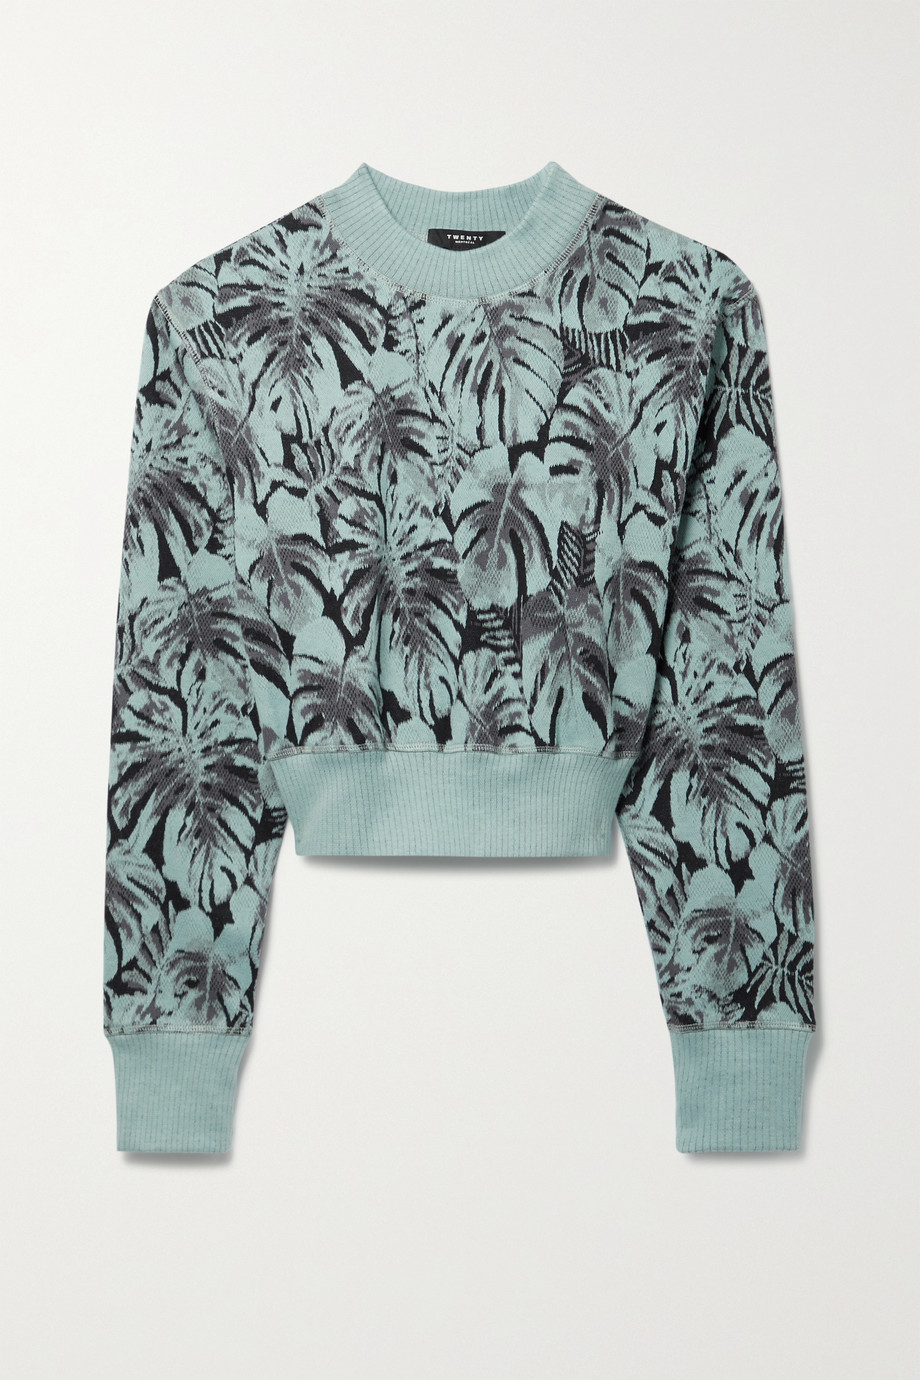 TWENTY Montréal Monstera Hyper Reality cropped jacquard-knit cotton-blend sweater